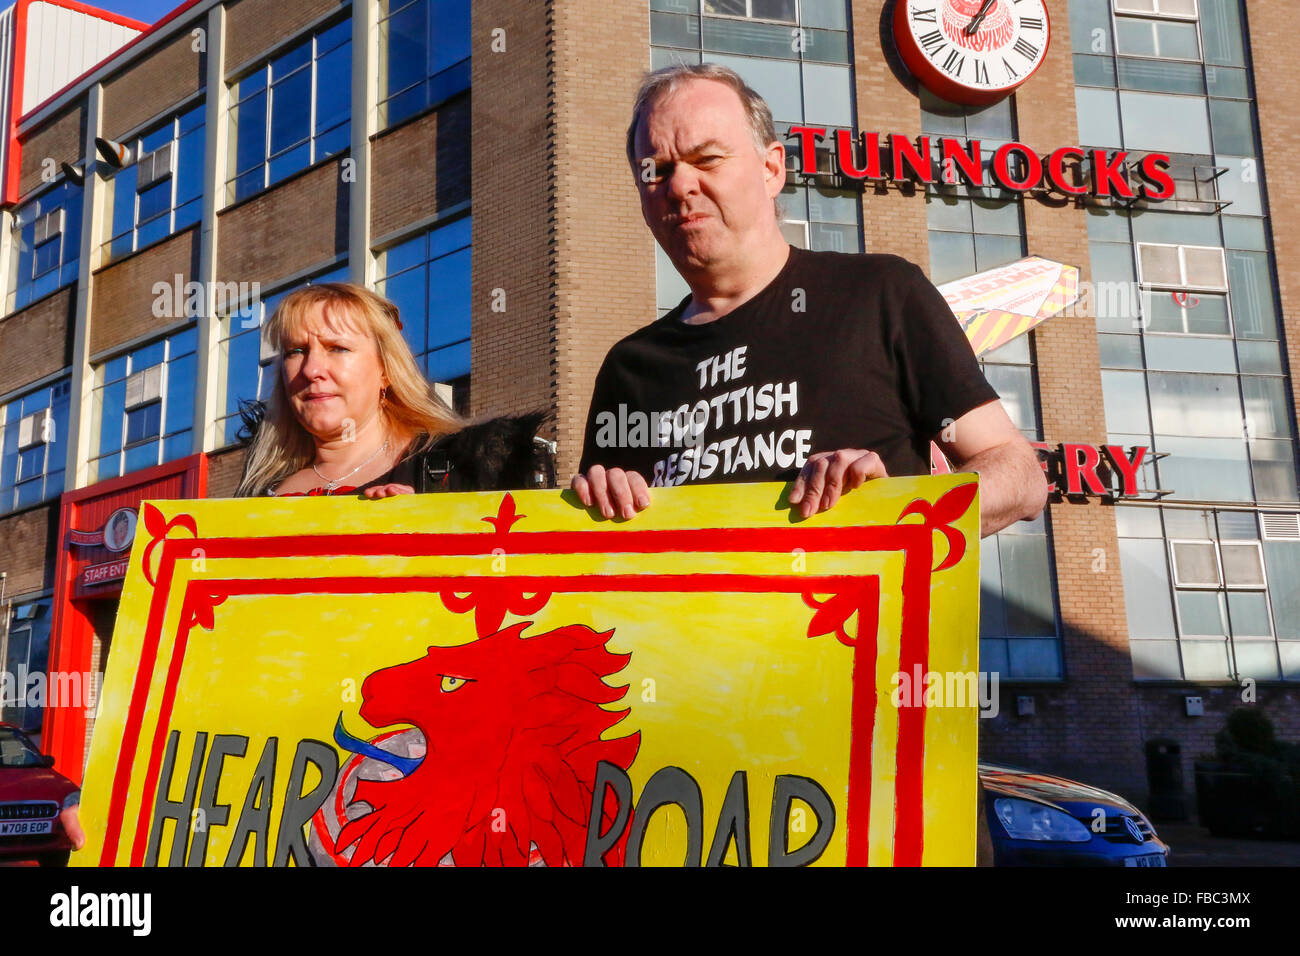 Uddingston, UK. 14th Jan, 2016. The Nationalist group 'Scottish Resistance'  held a demonstration outside - Stock Image